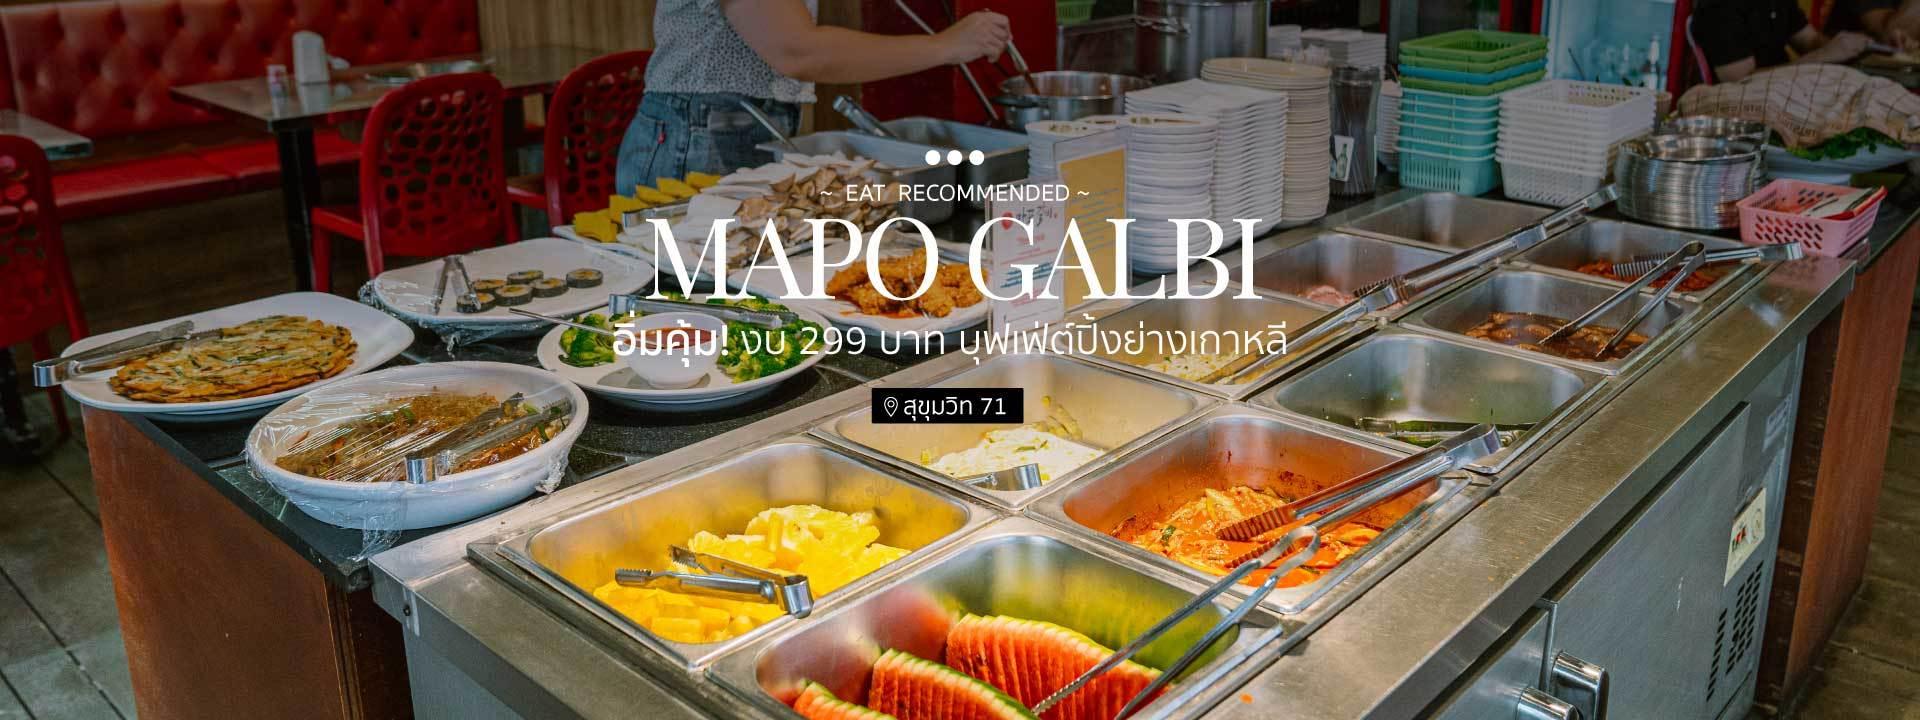 MAPO GALBI cover 1920x720 web